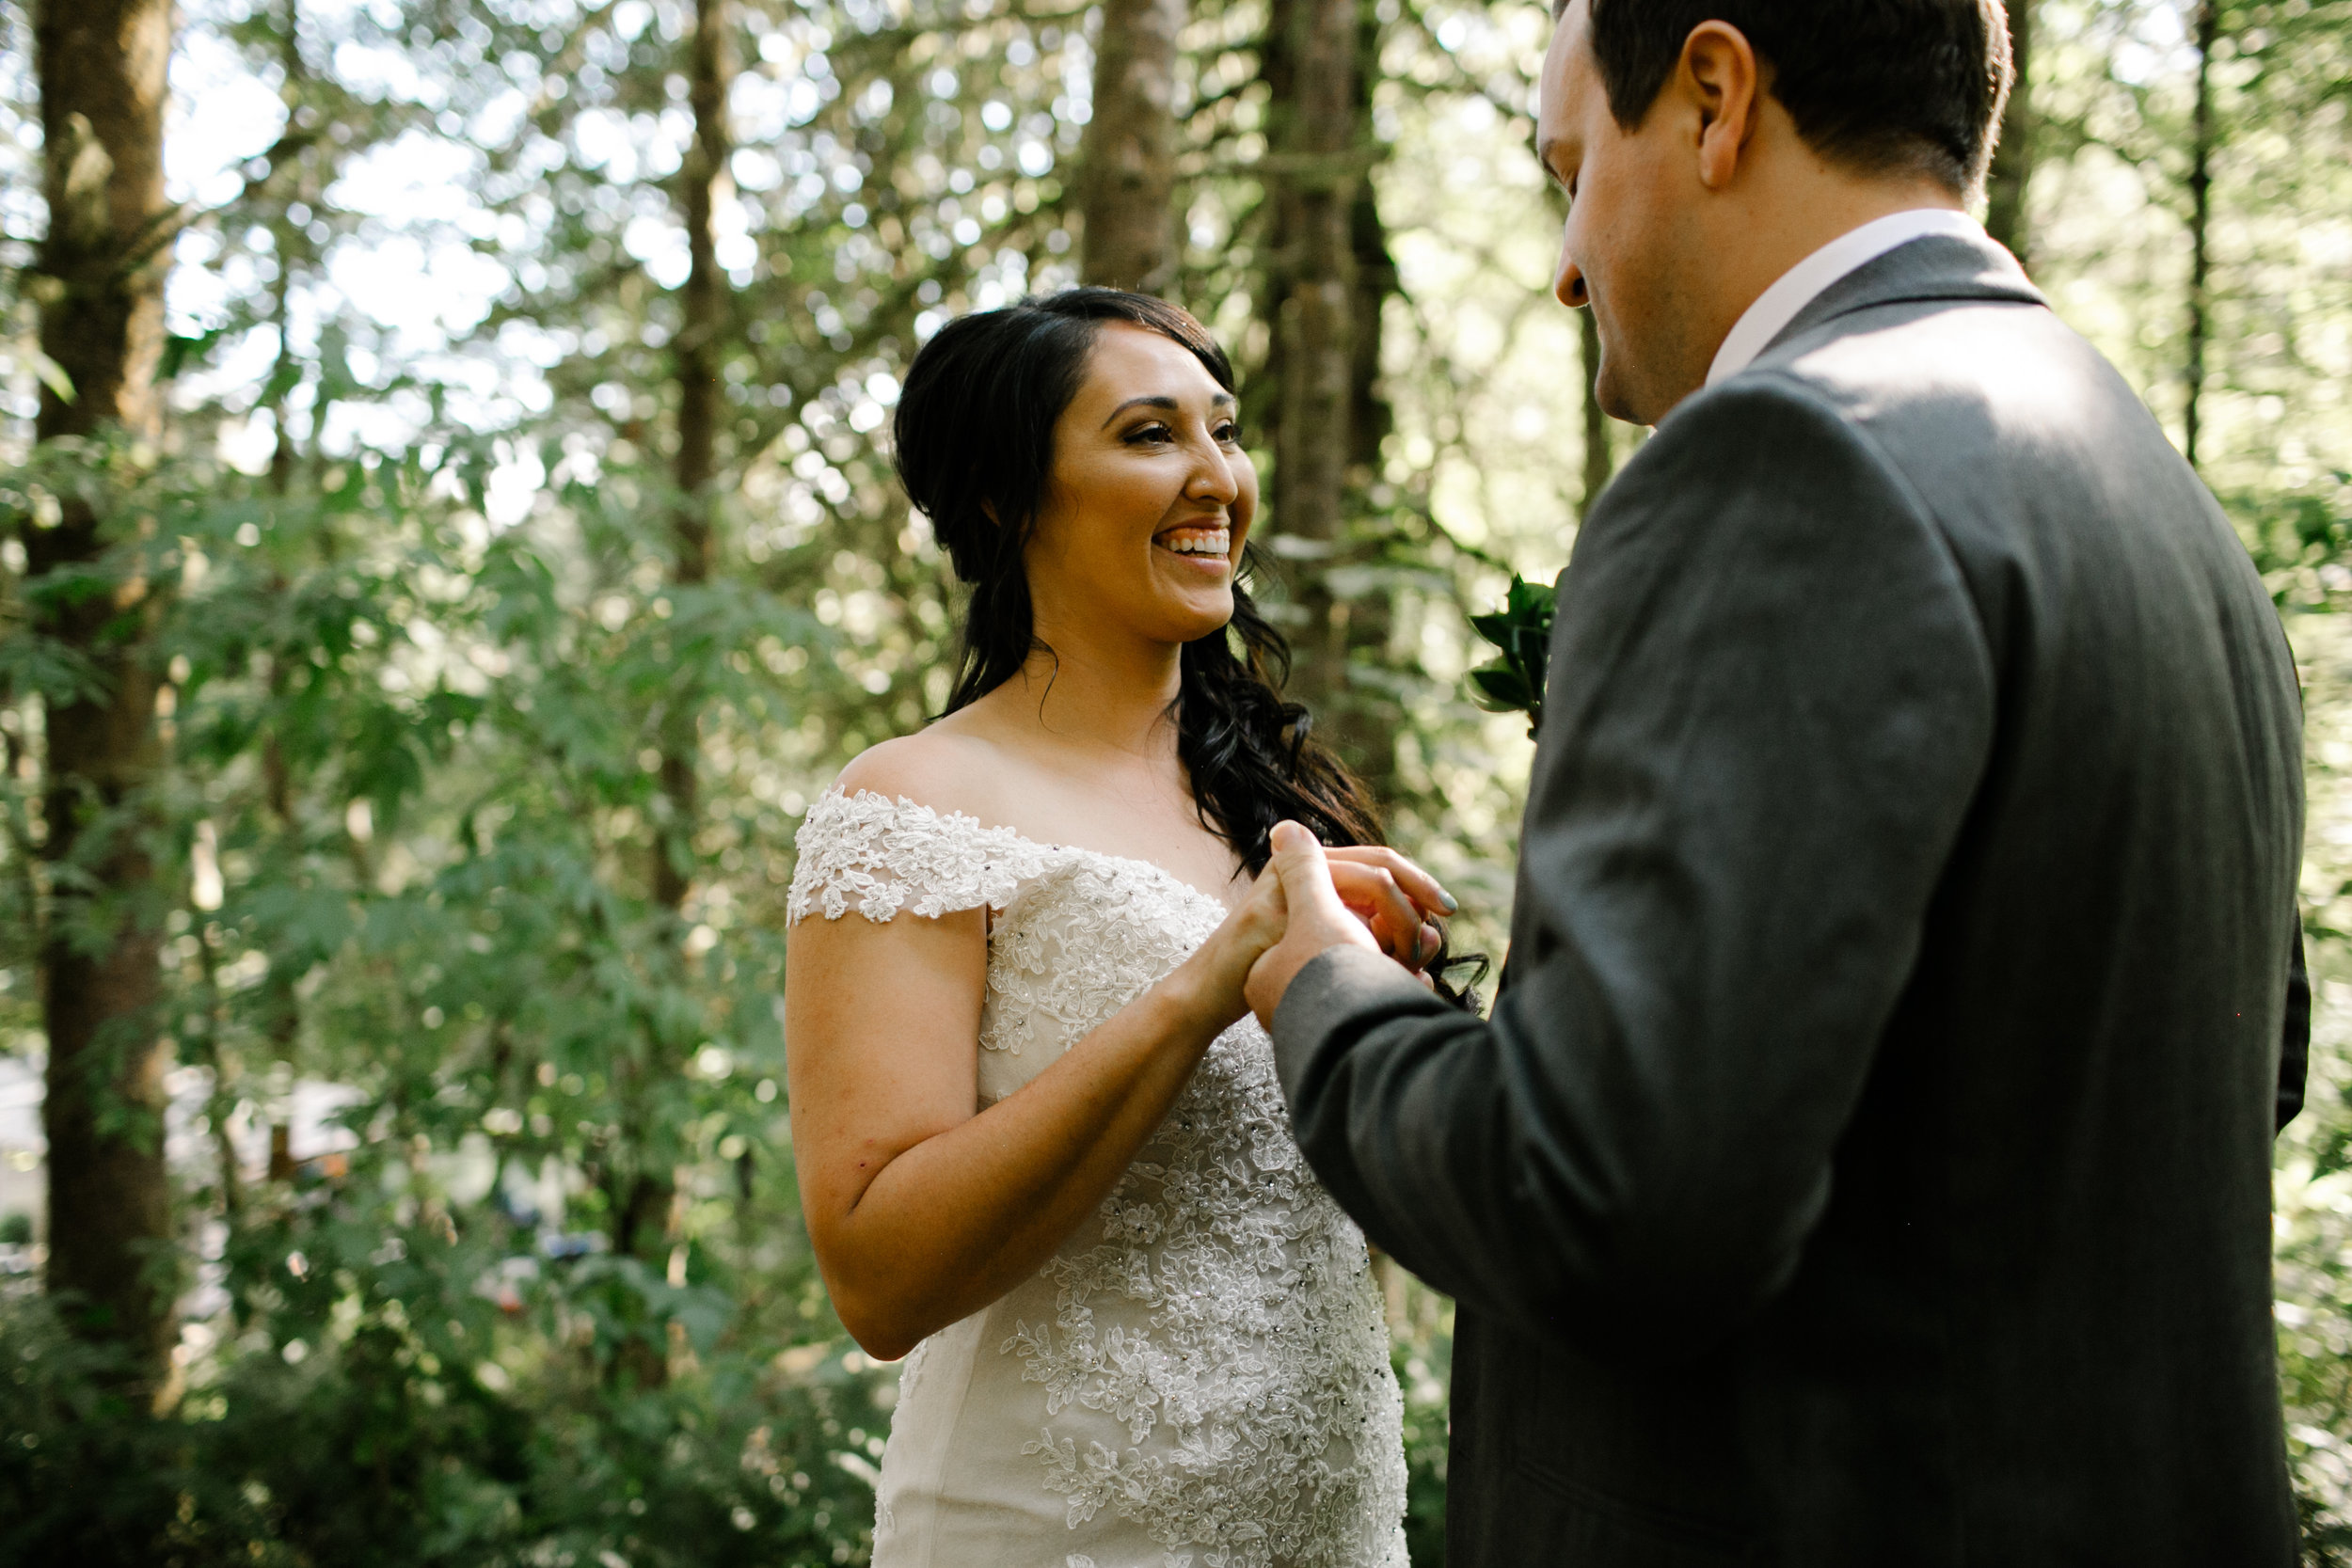 Sevlynn-Photography-Teresa-Chandler-Wedding-14.jpg